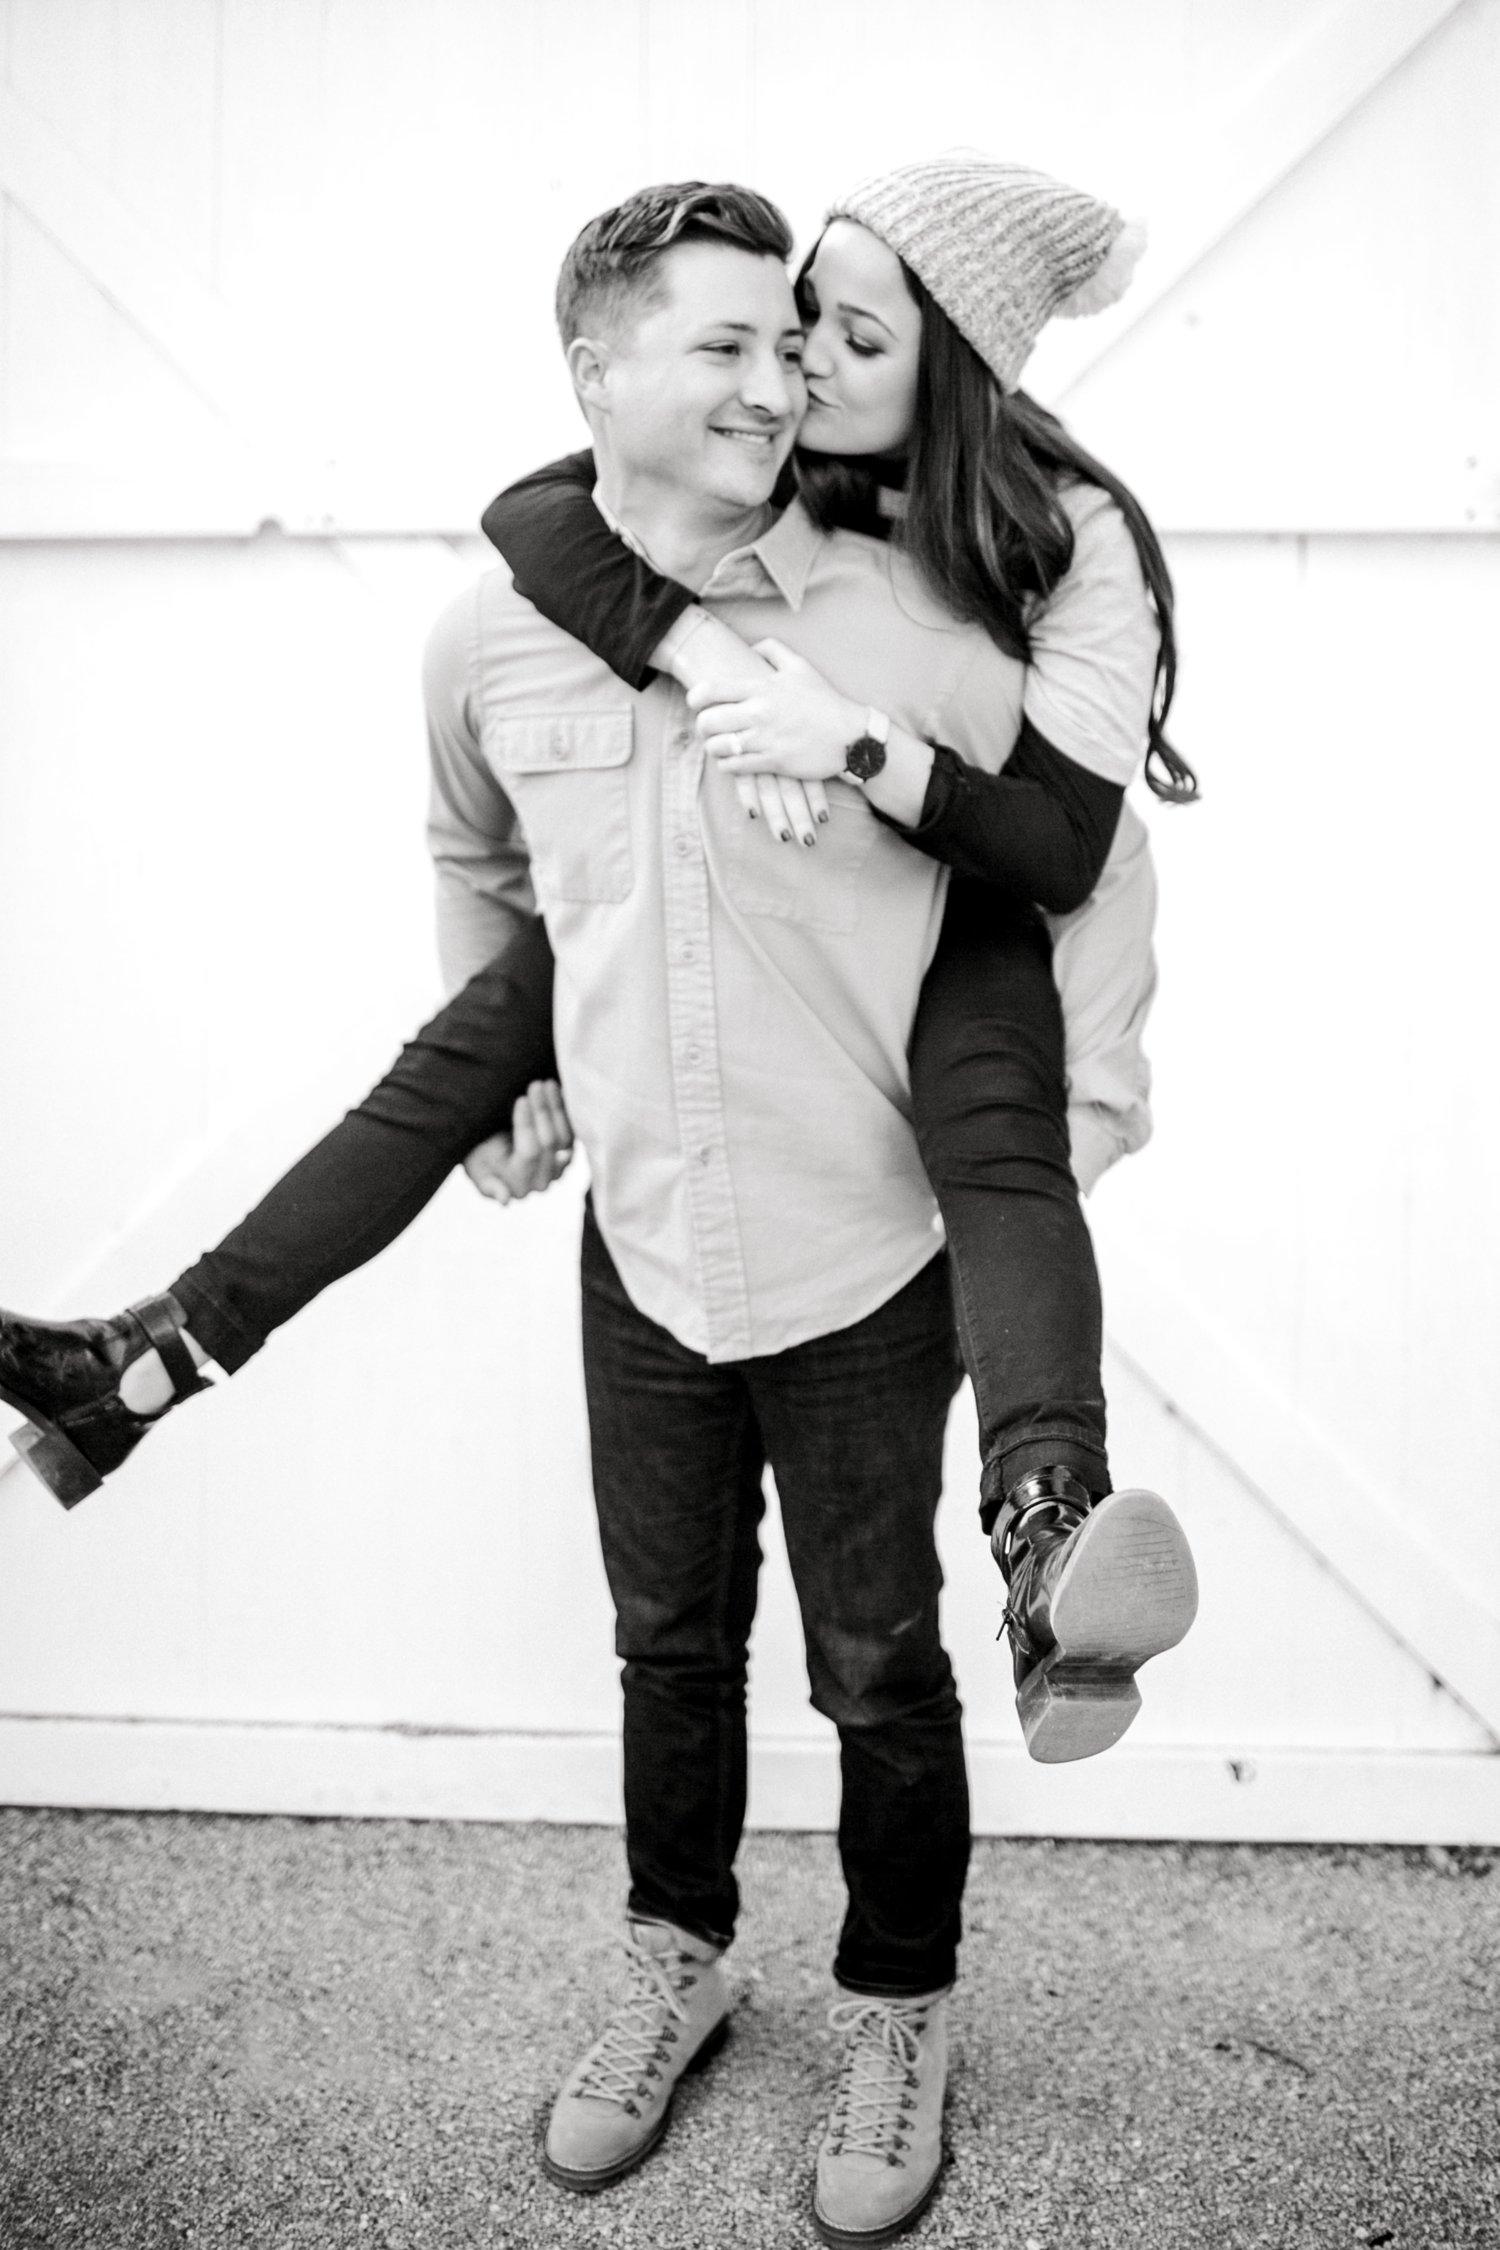 Steven-and-jenna-taubena-lubbock-texas-photographer_0017.jpg